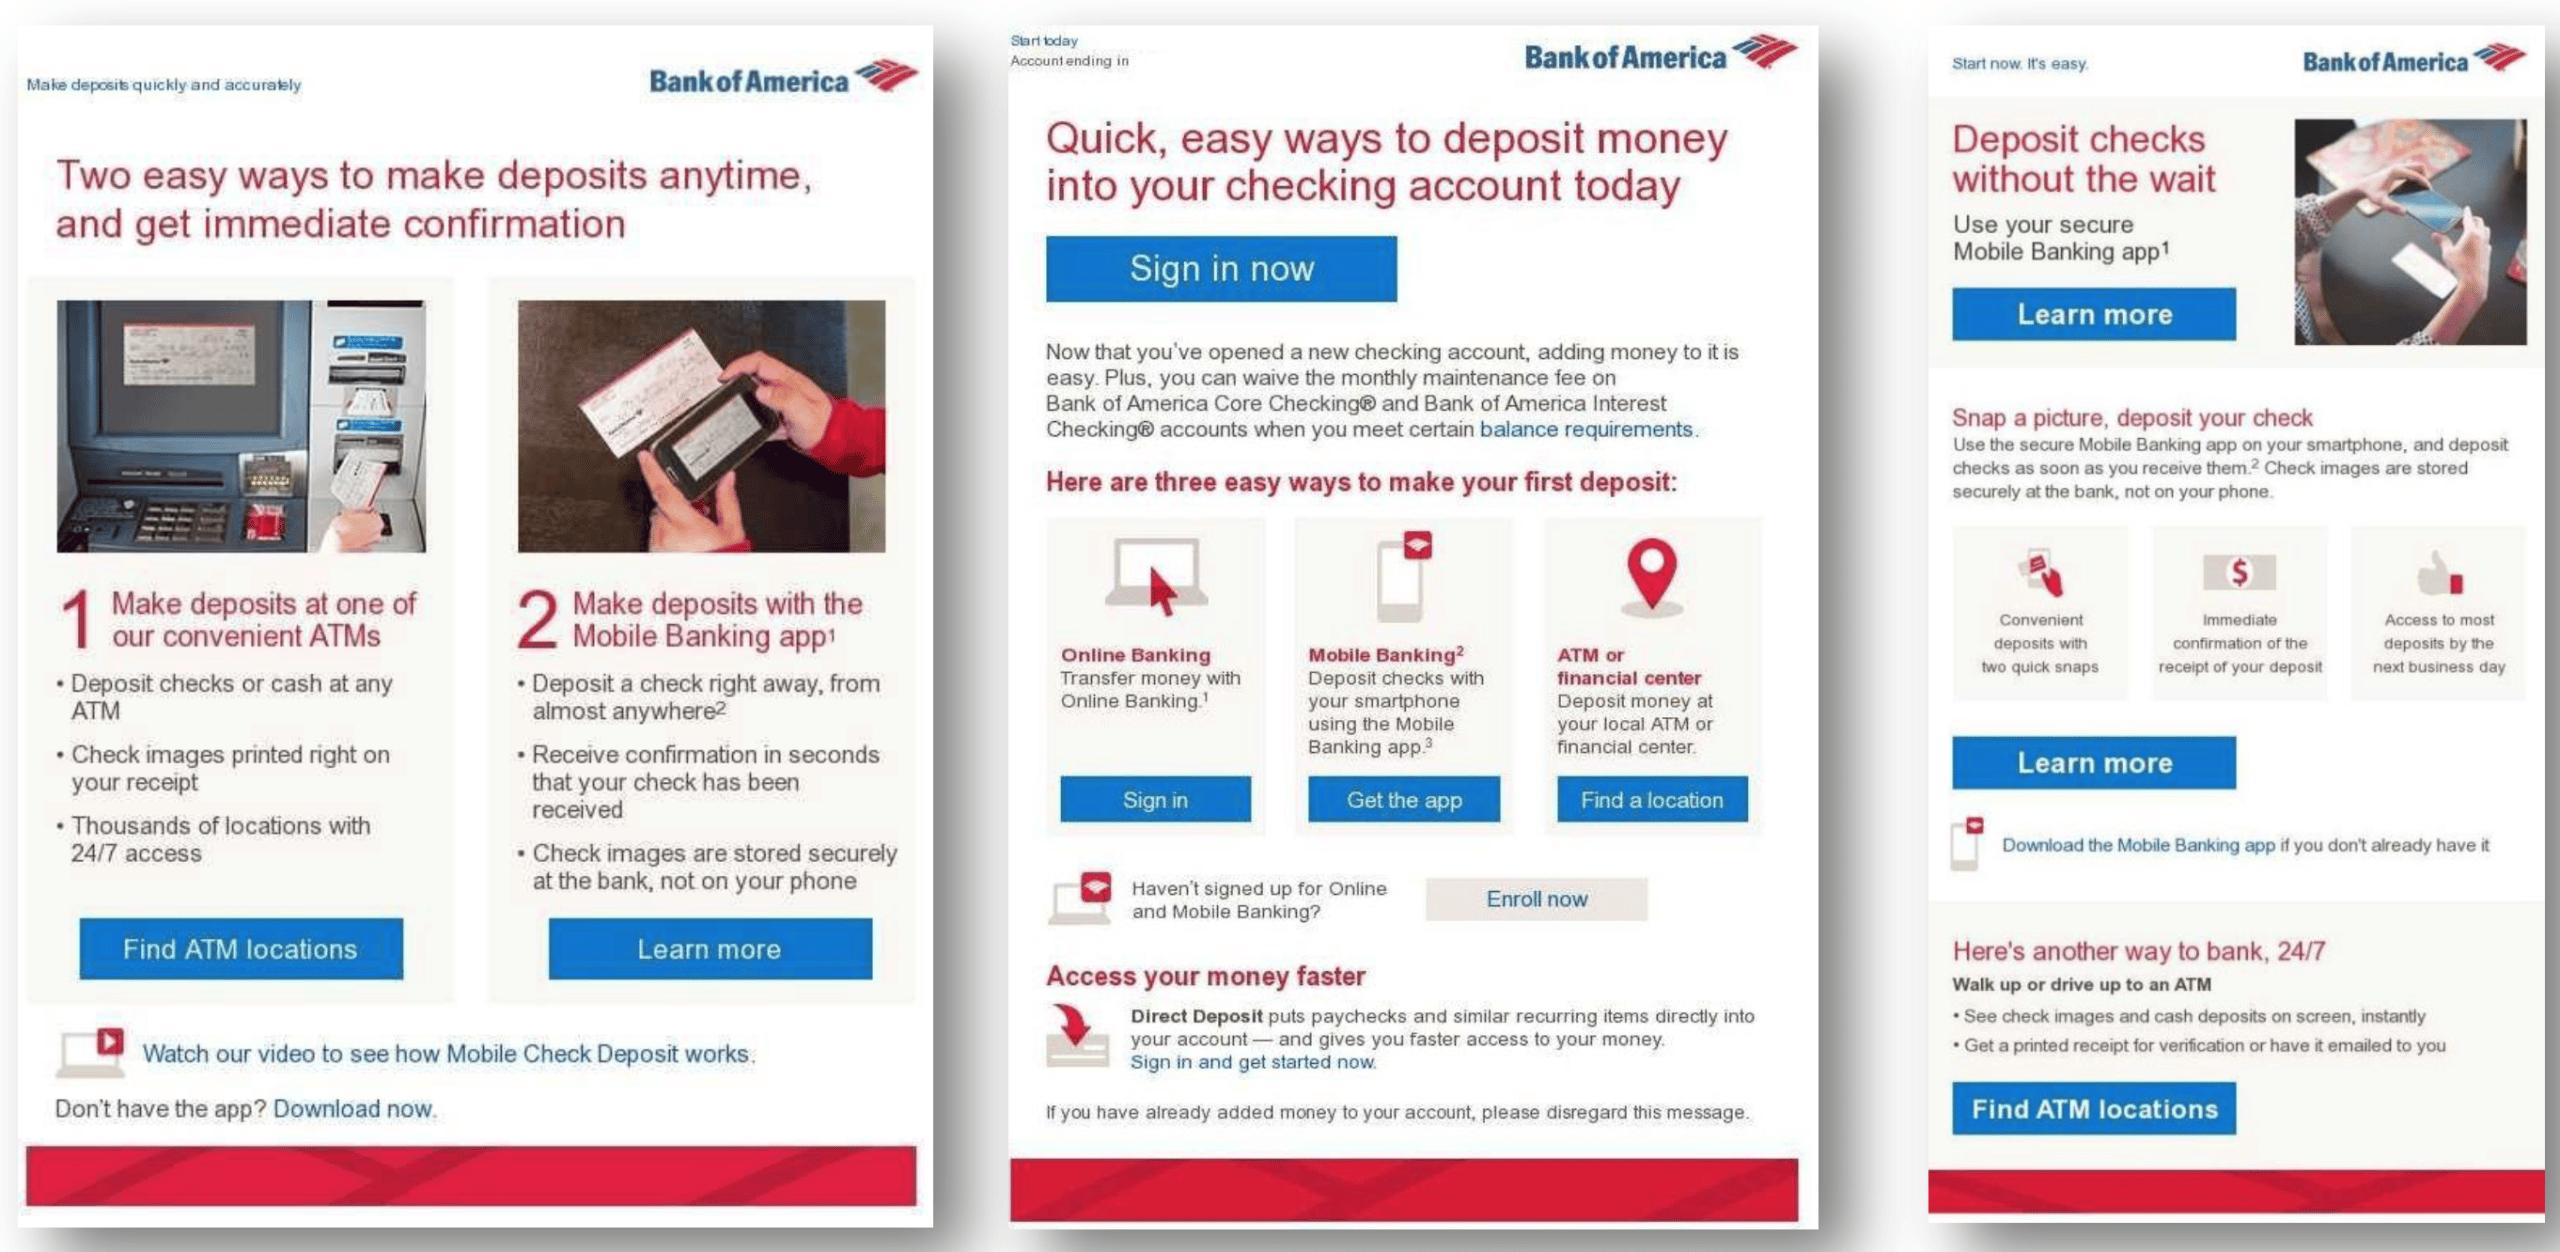 bank of america deposit alternatives email